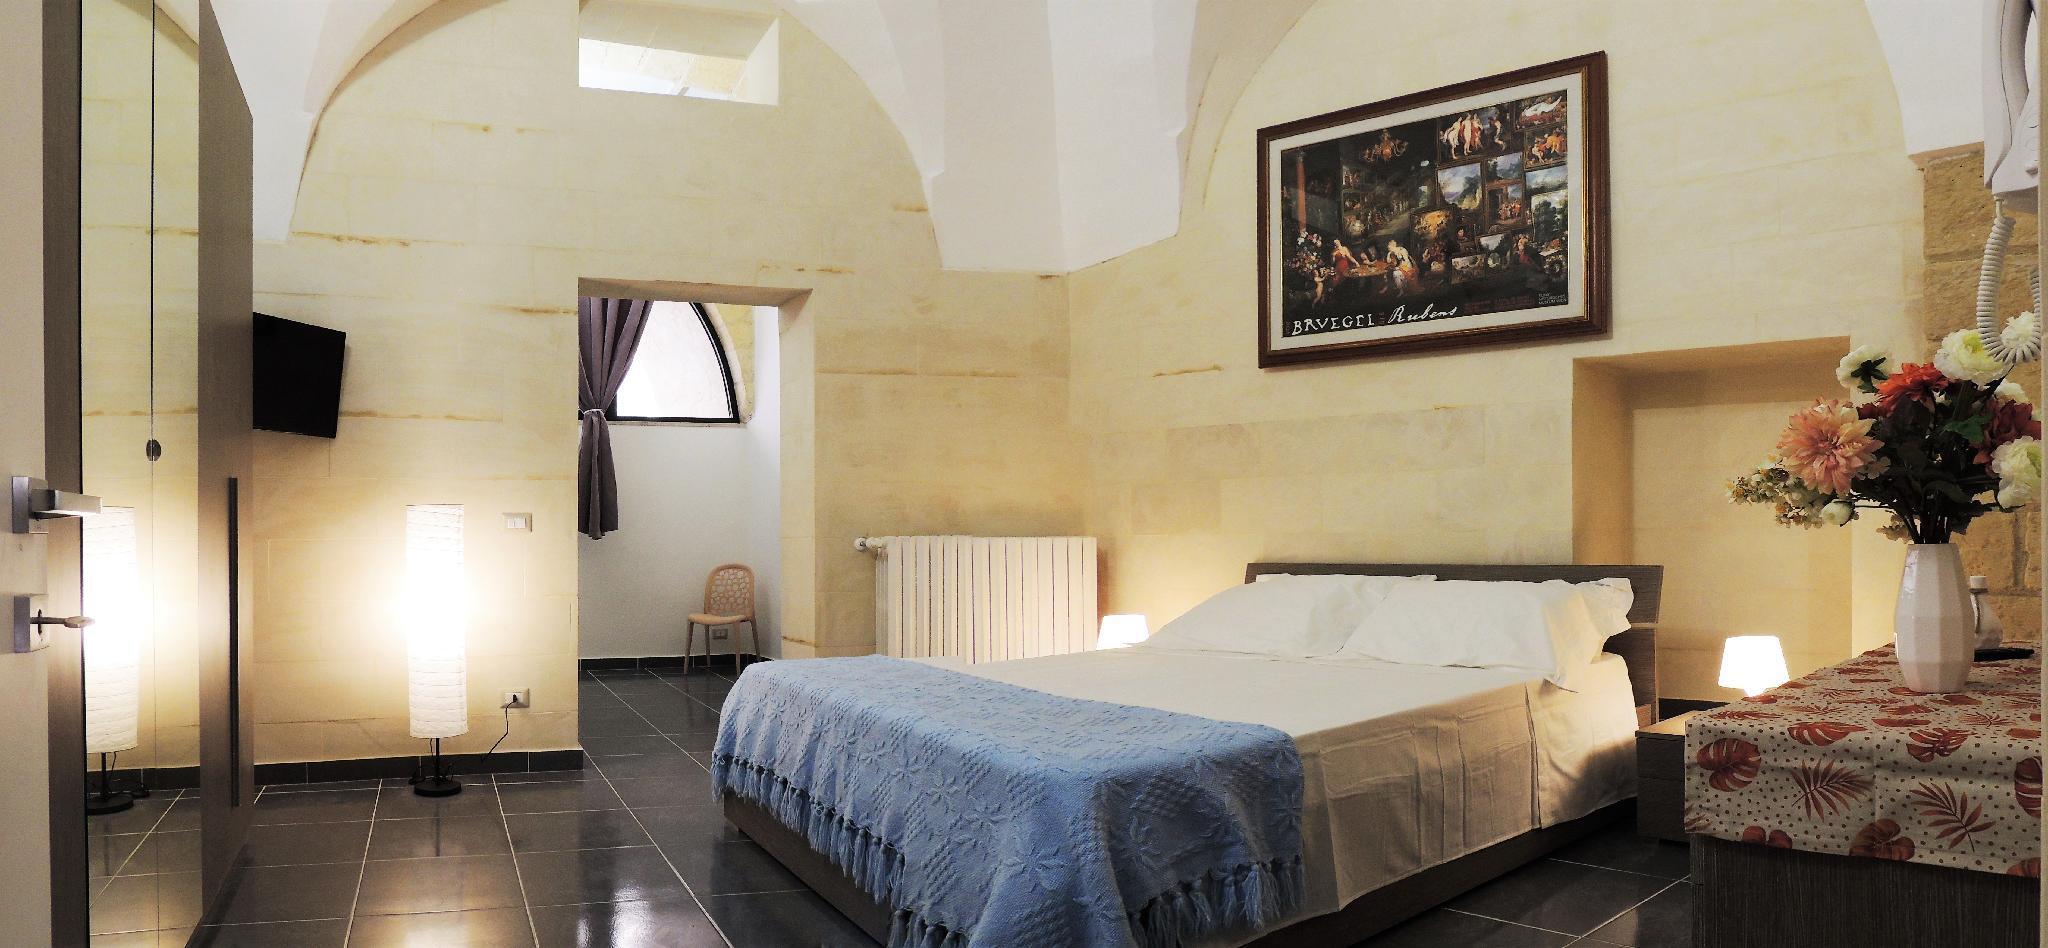 Oikia Vacanze Lecce Santa Irene